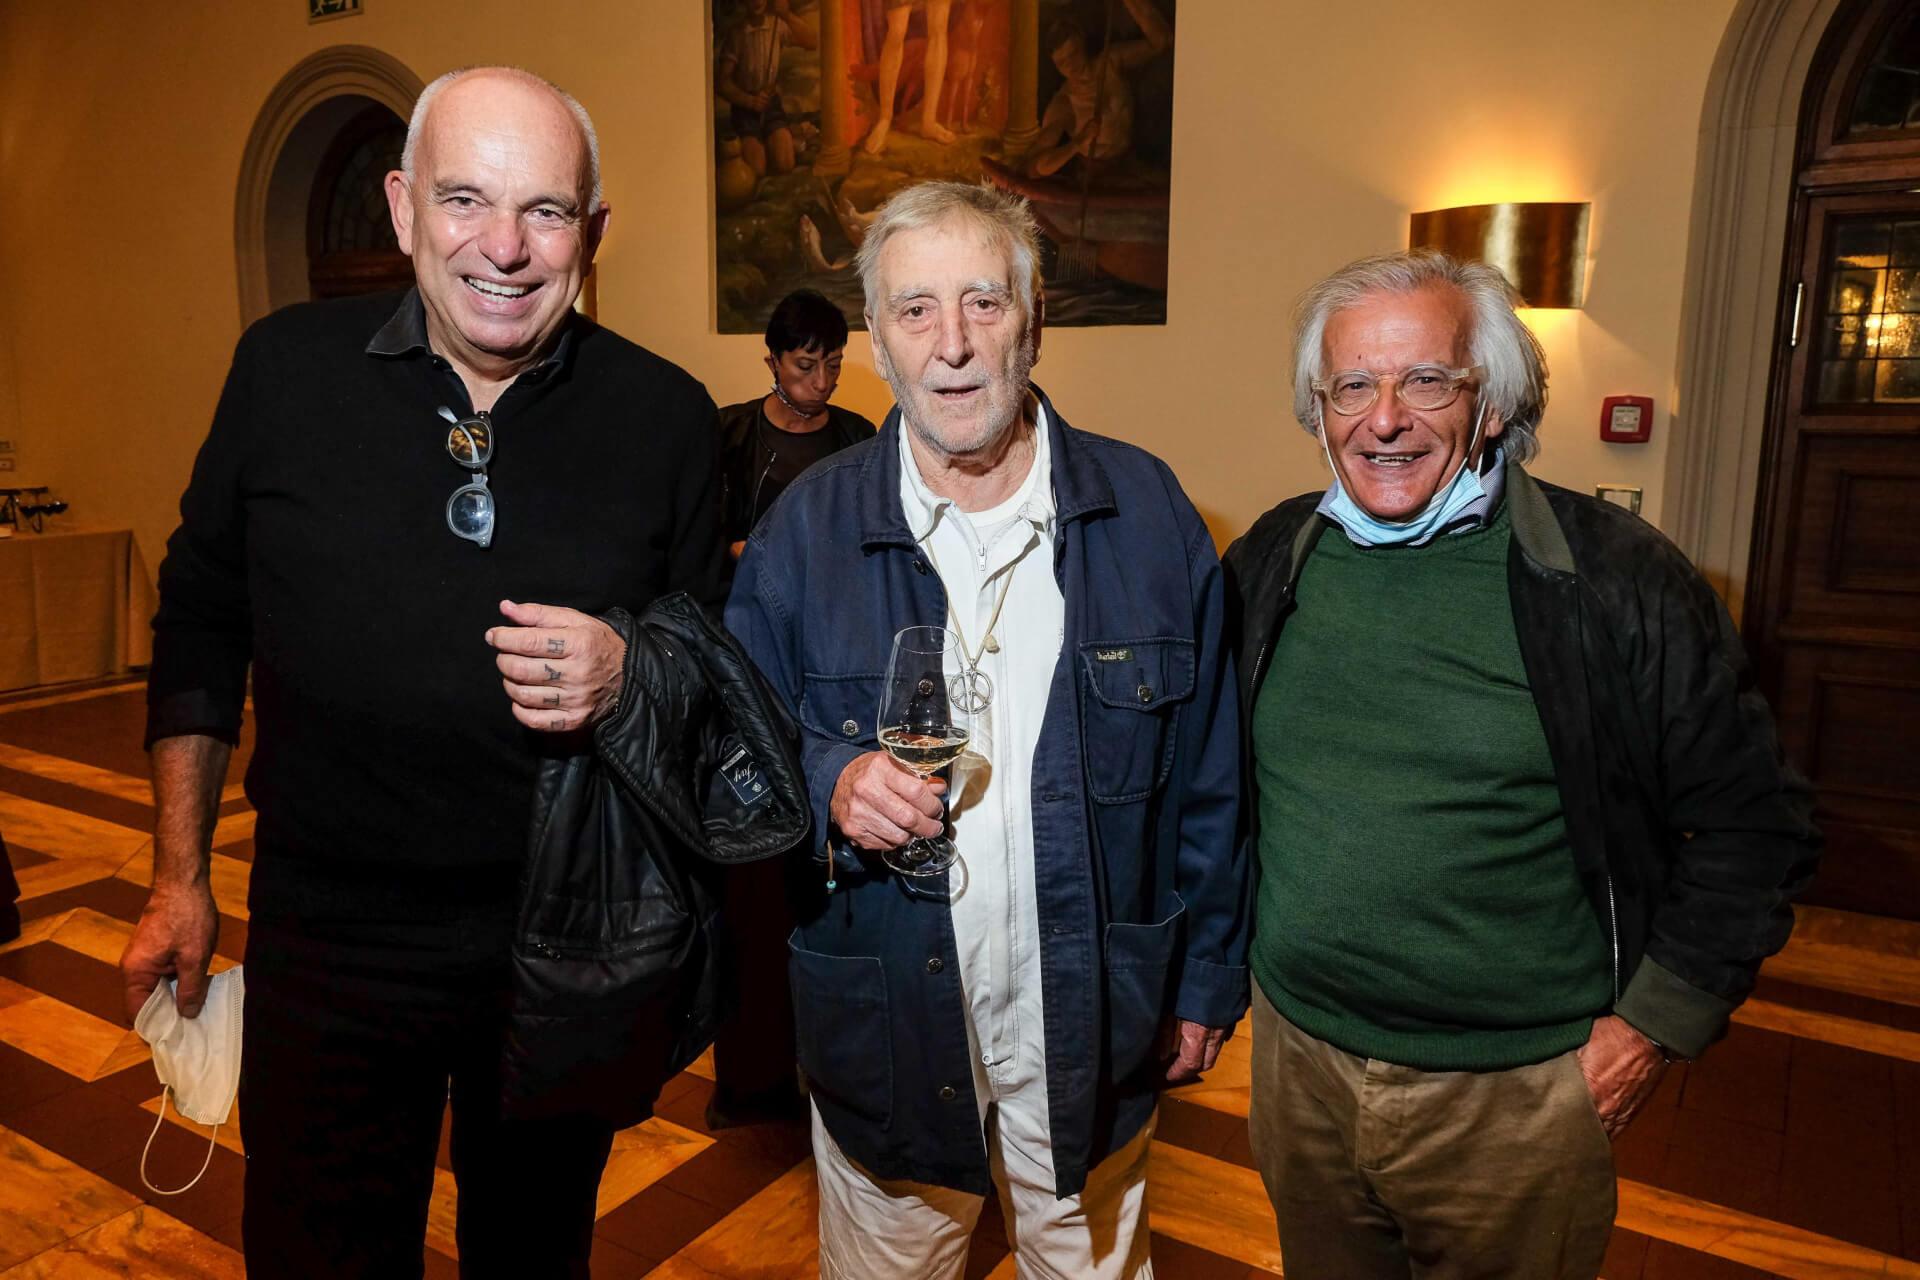 oGiovanni Raspini, Giancarlo Fulgenzi e Rodolfo Bertacca